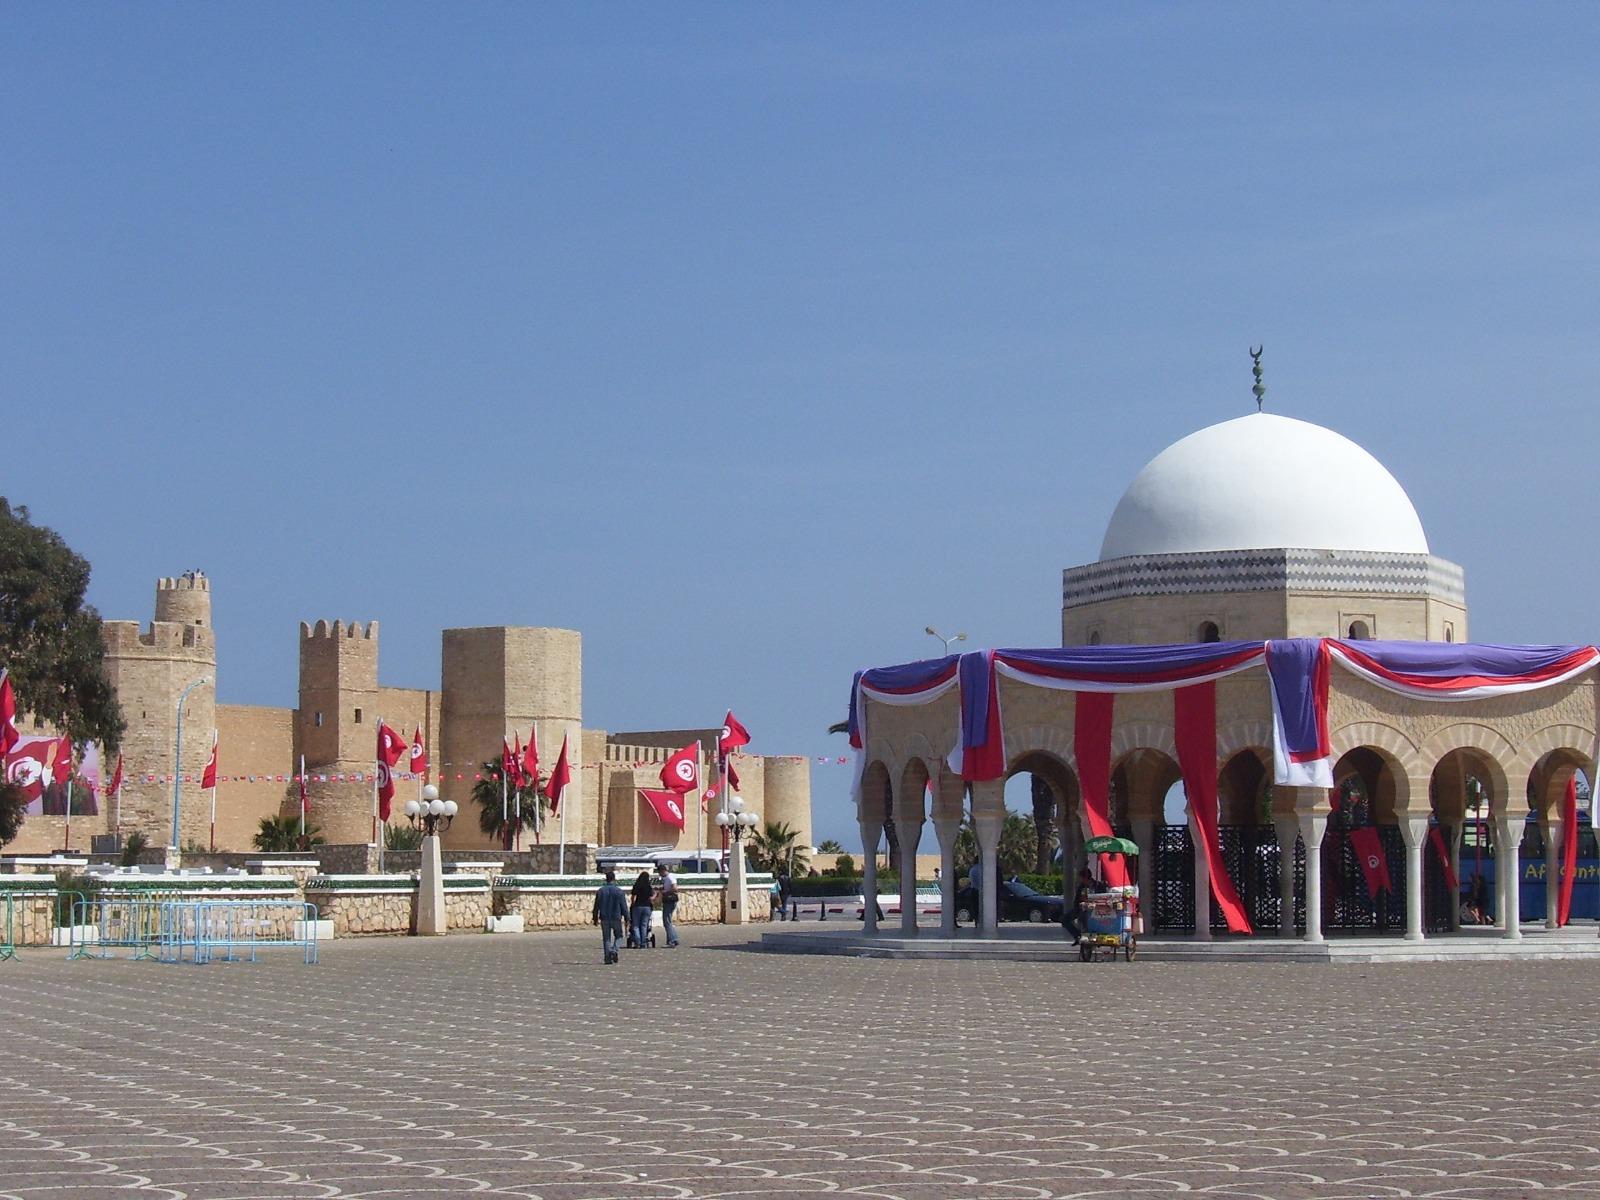 tumba - cúpula - torres - fortaleza - arcos - bander